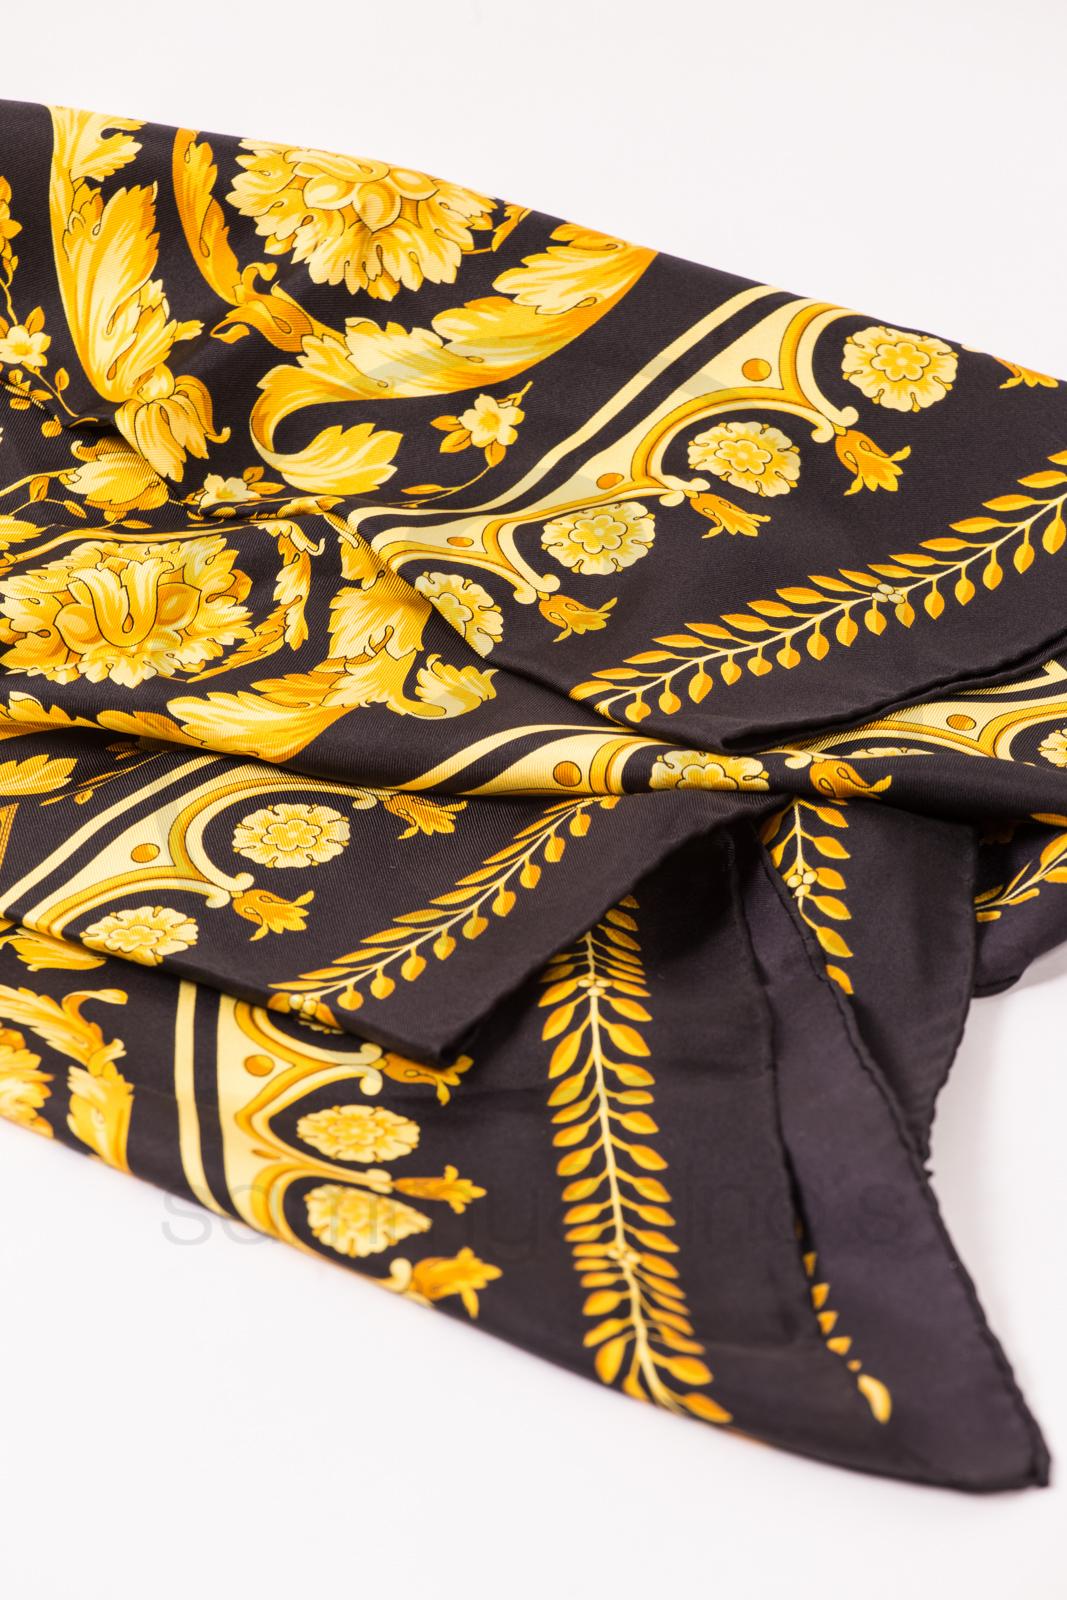 Gianni Versace Silk Foulard Scarf Sammy Amp Nino S Store